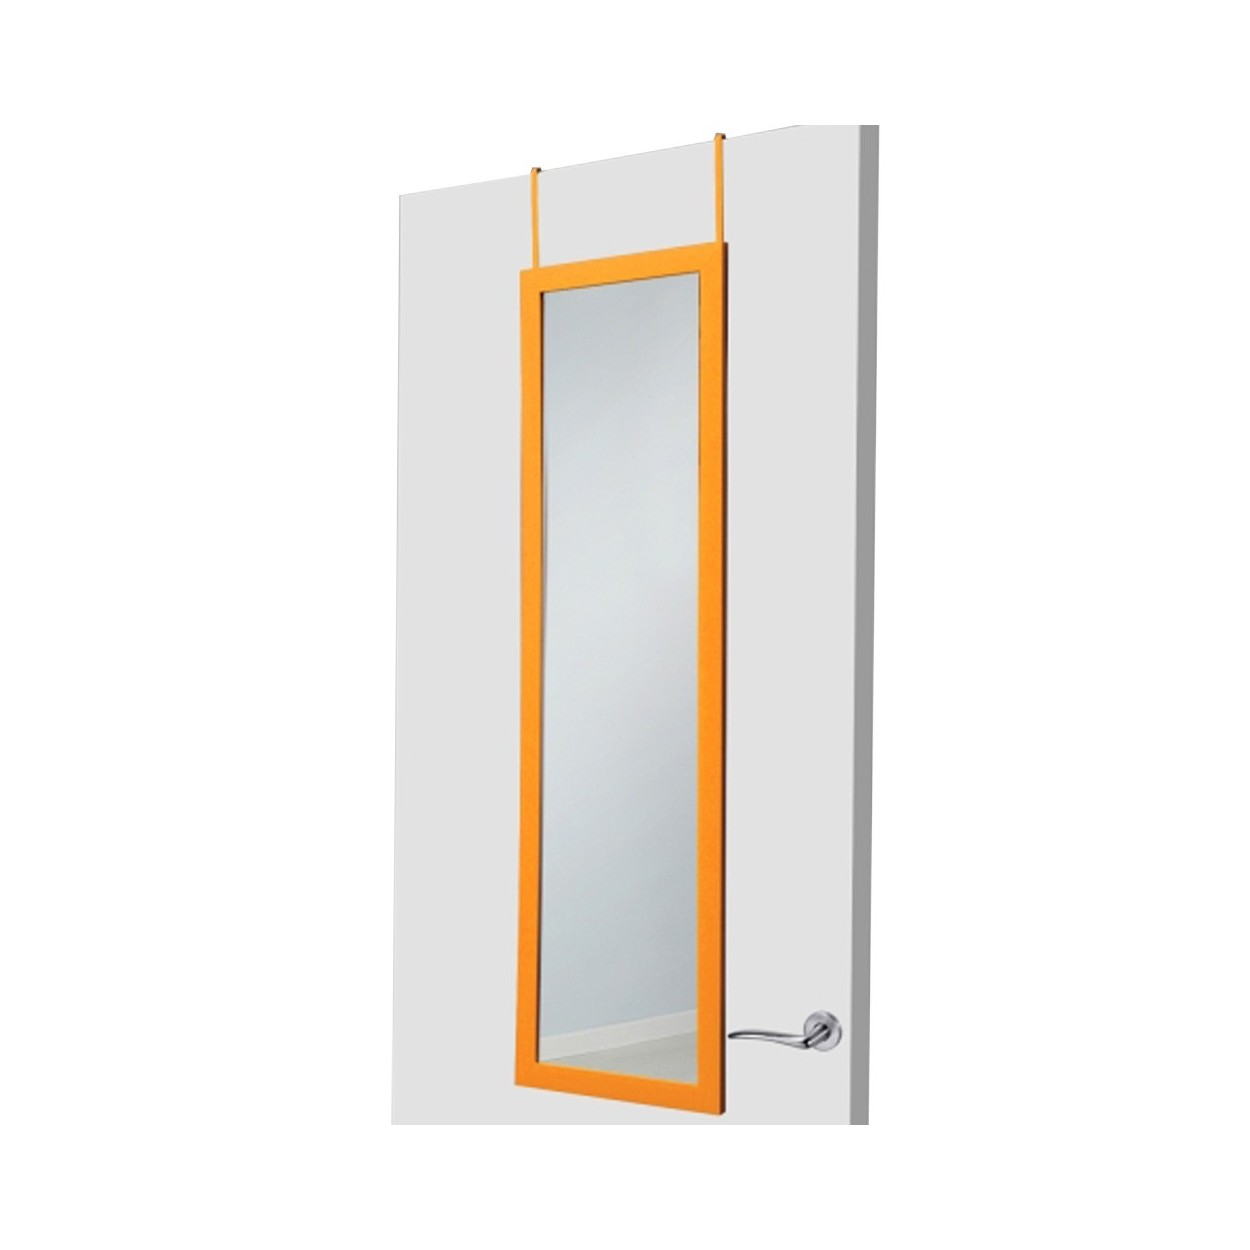 espejo para puerta naranja sin agujeros hogar y m s